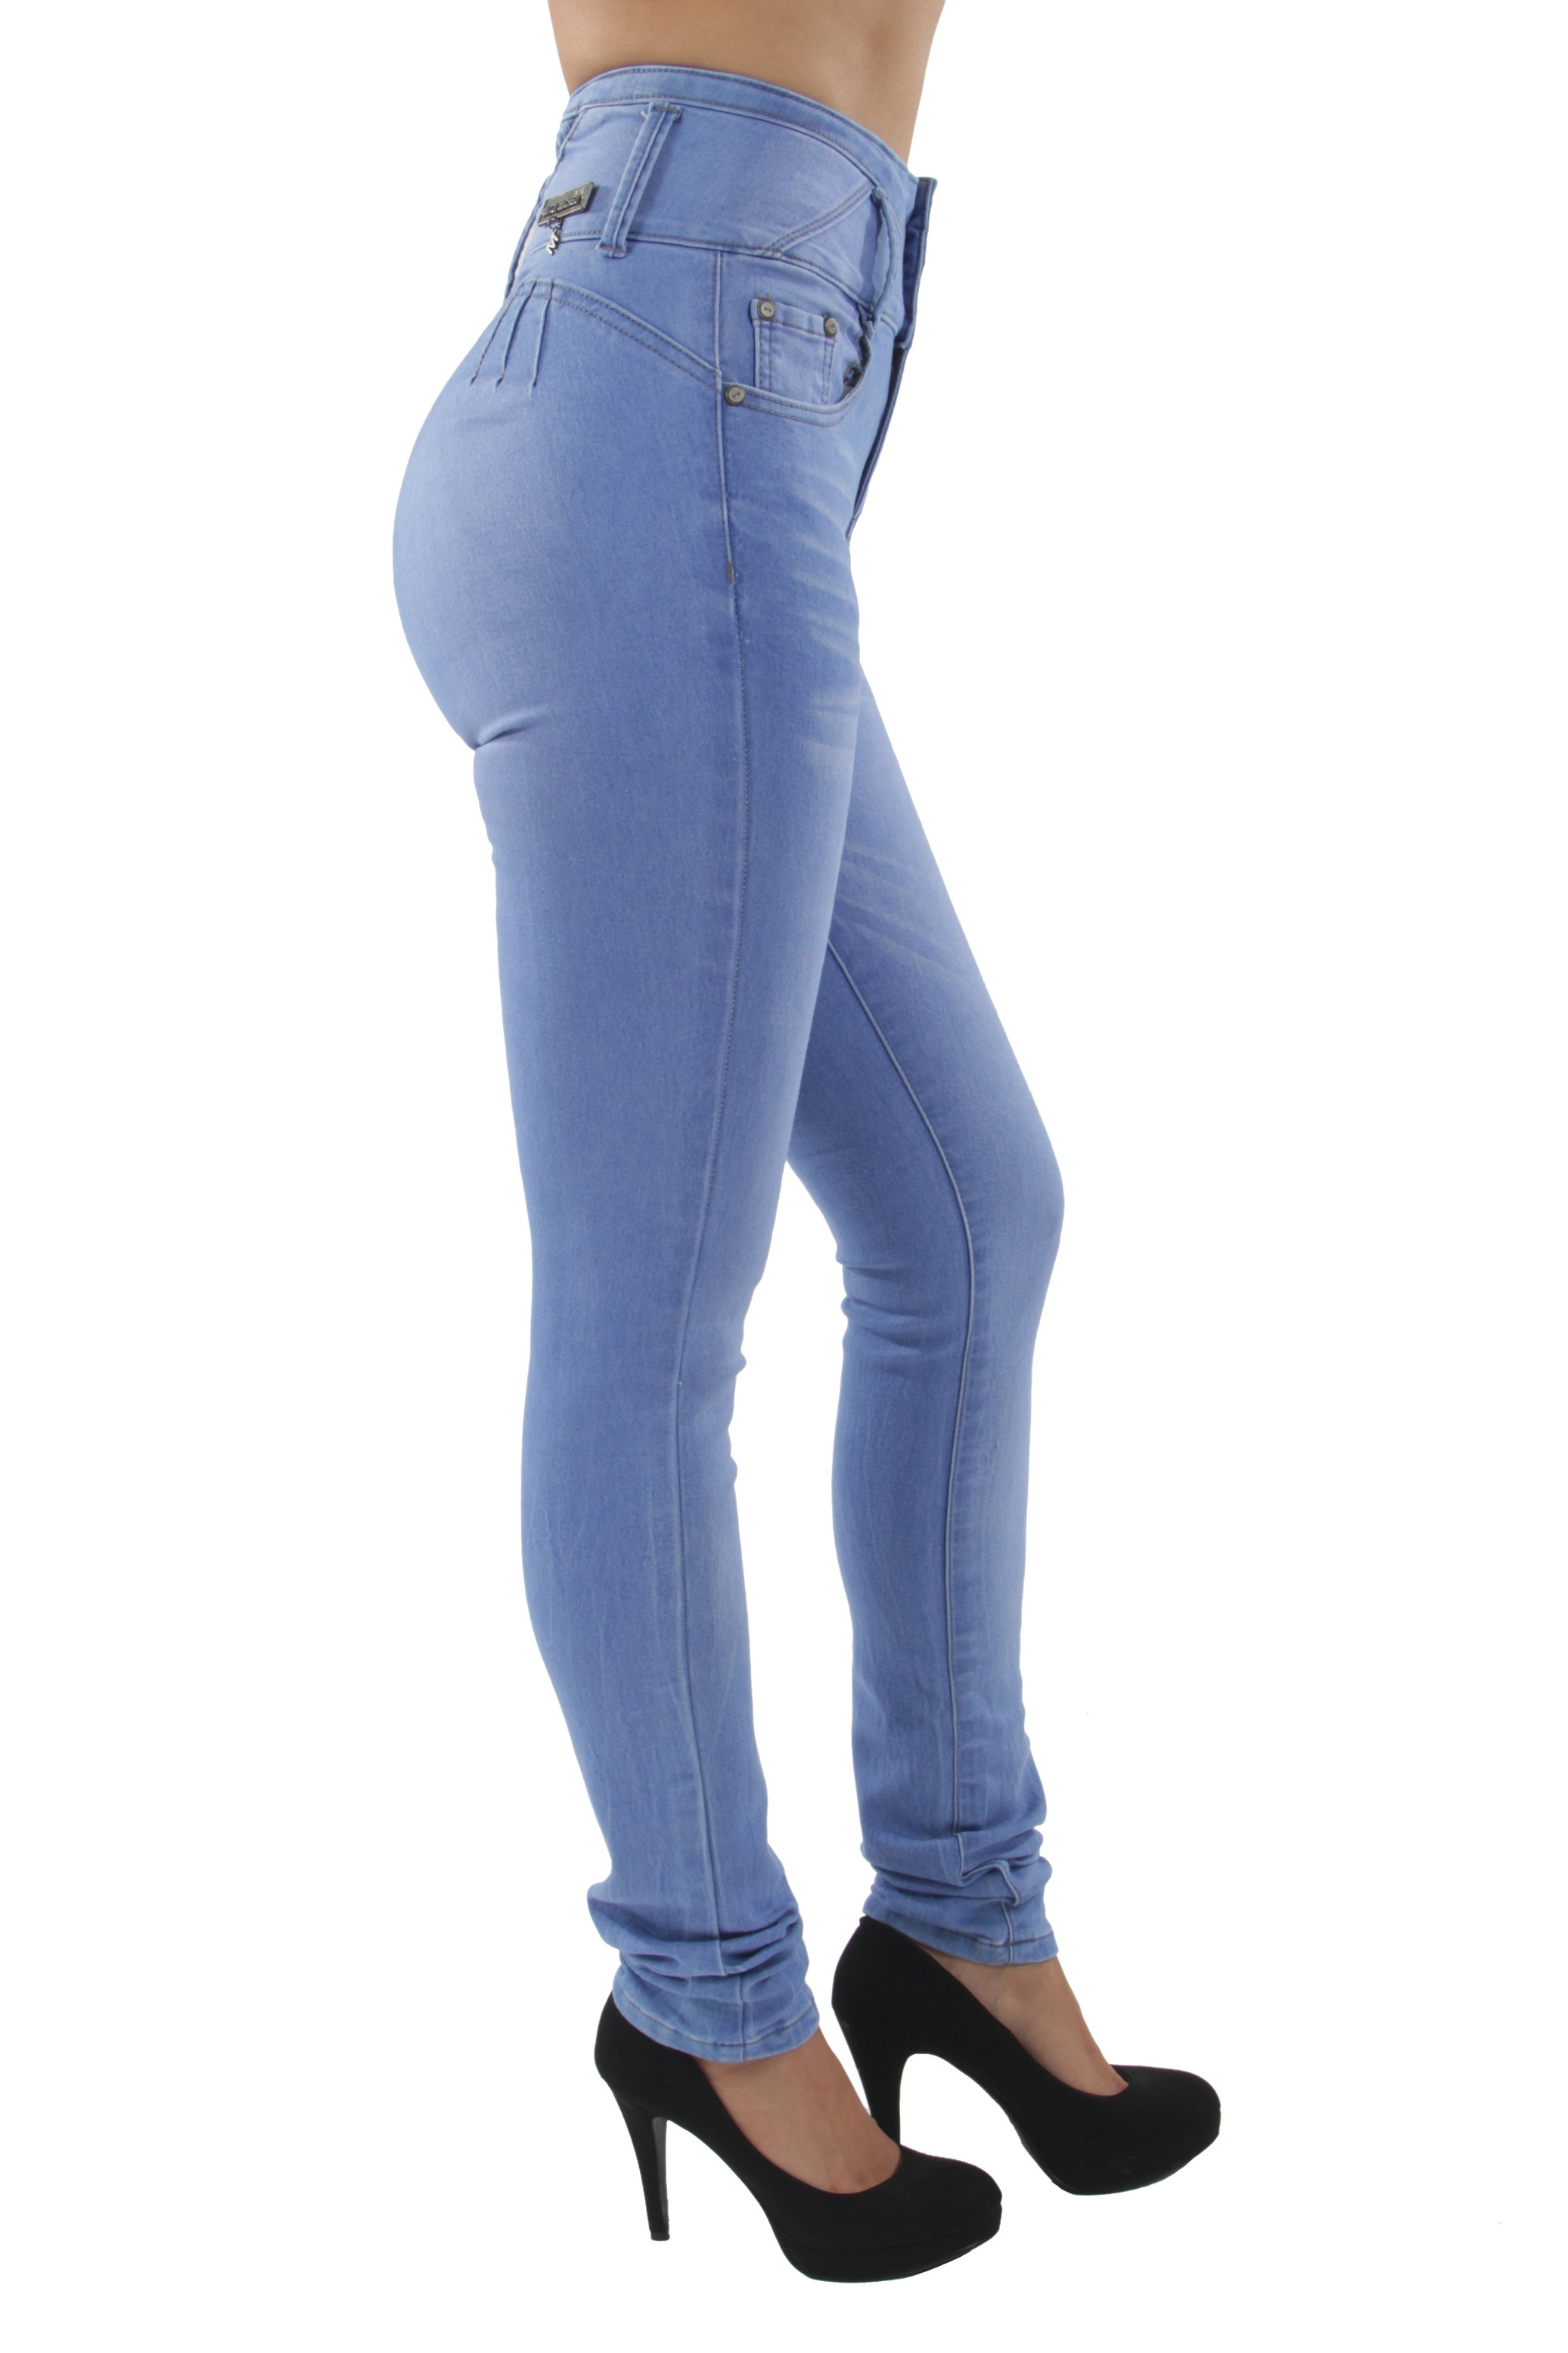 S6490-Colombian-Design-Butt-Lift-Push-Up-High-Elastic-Waist-Skinny-Jeans